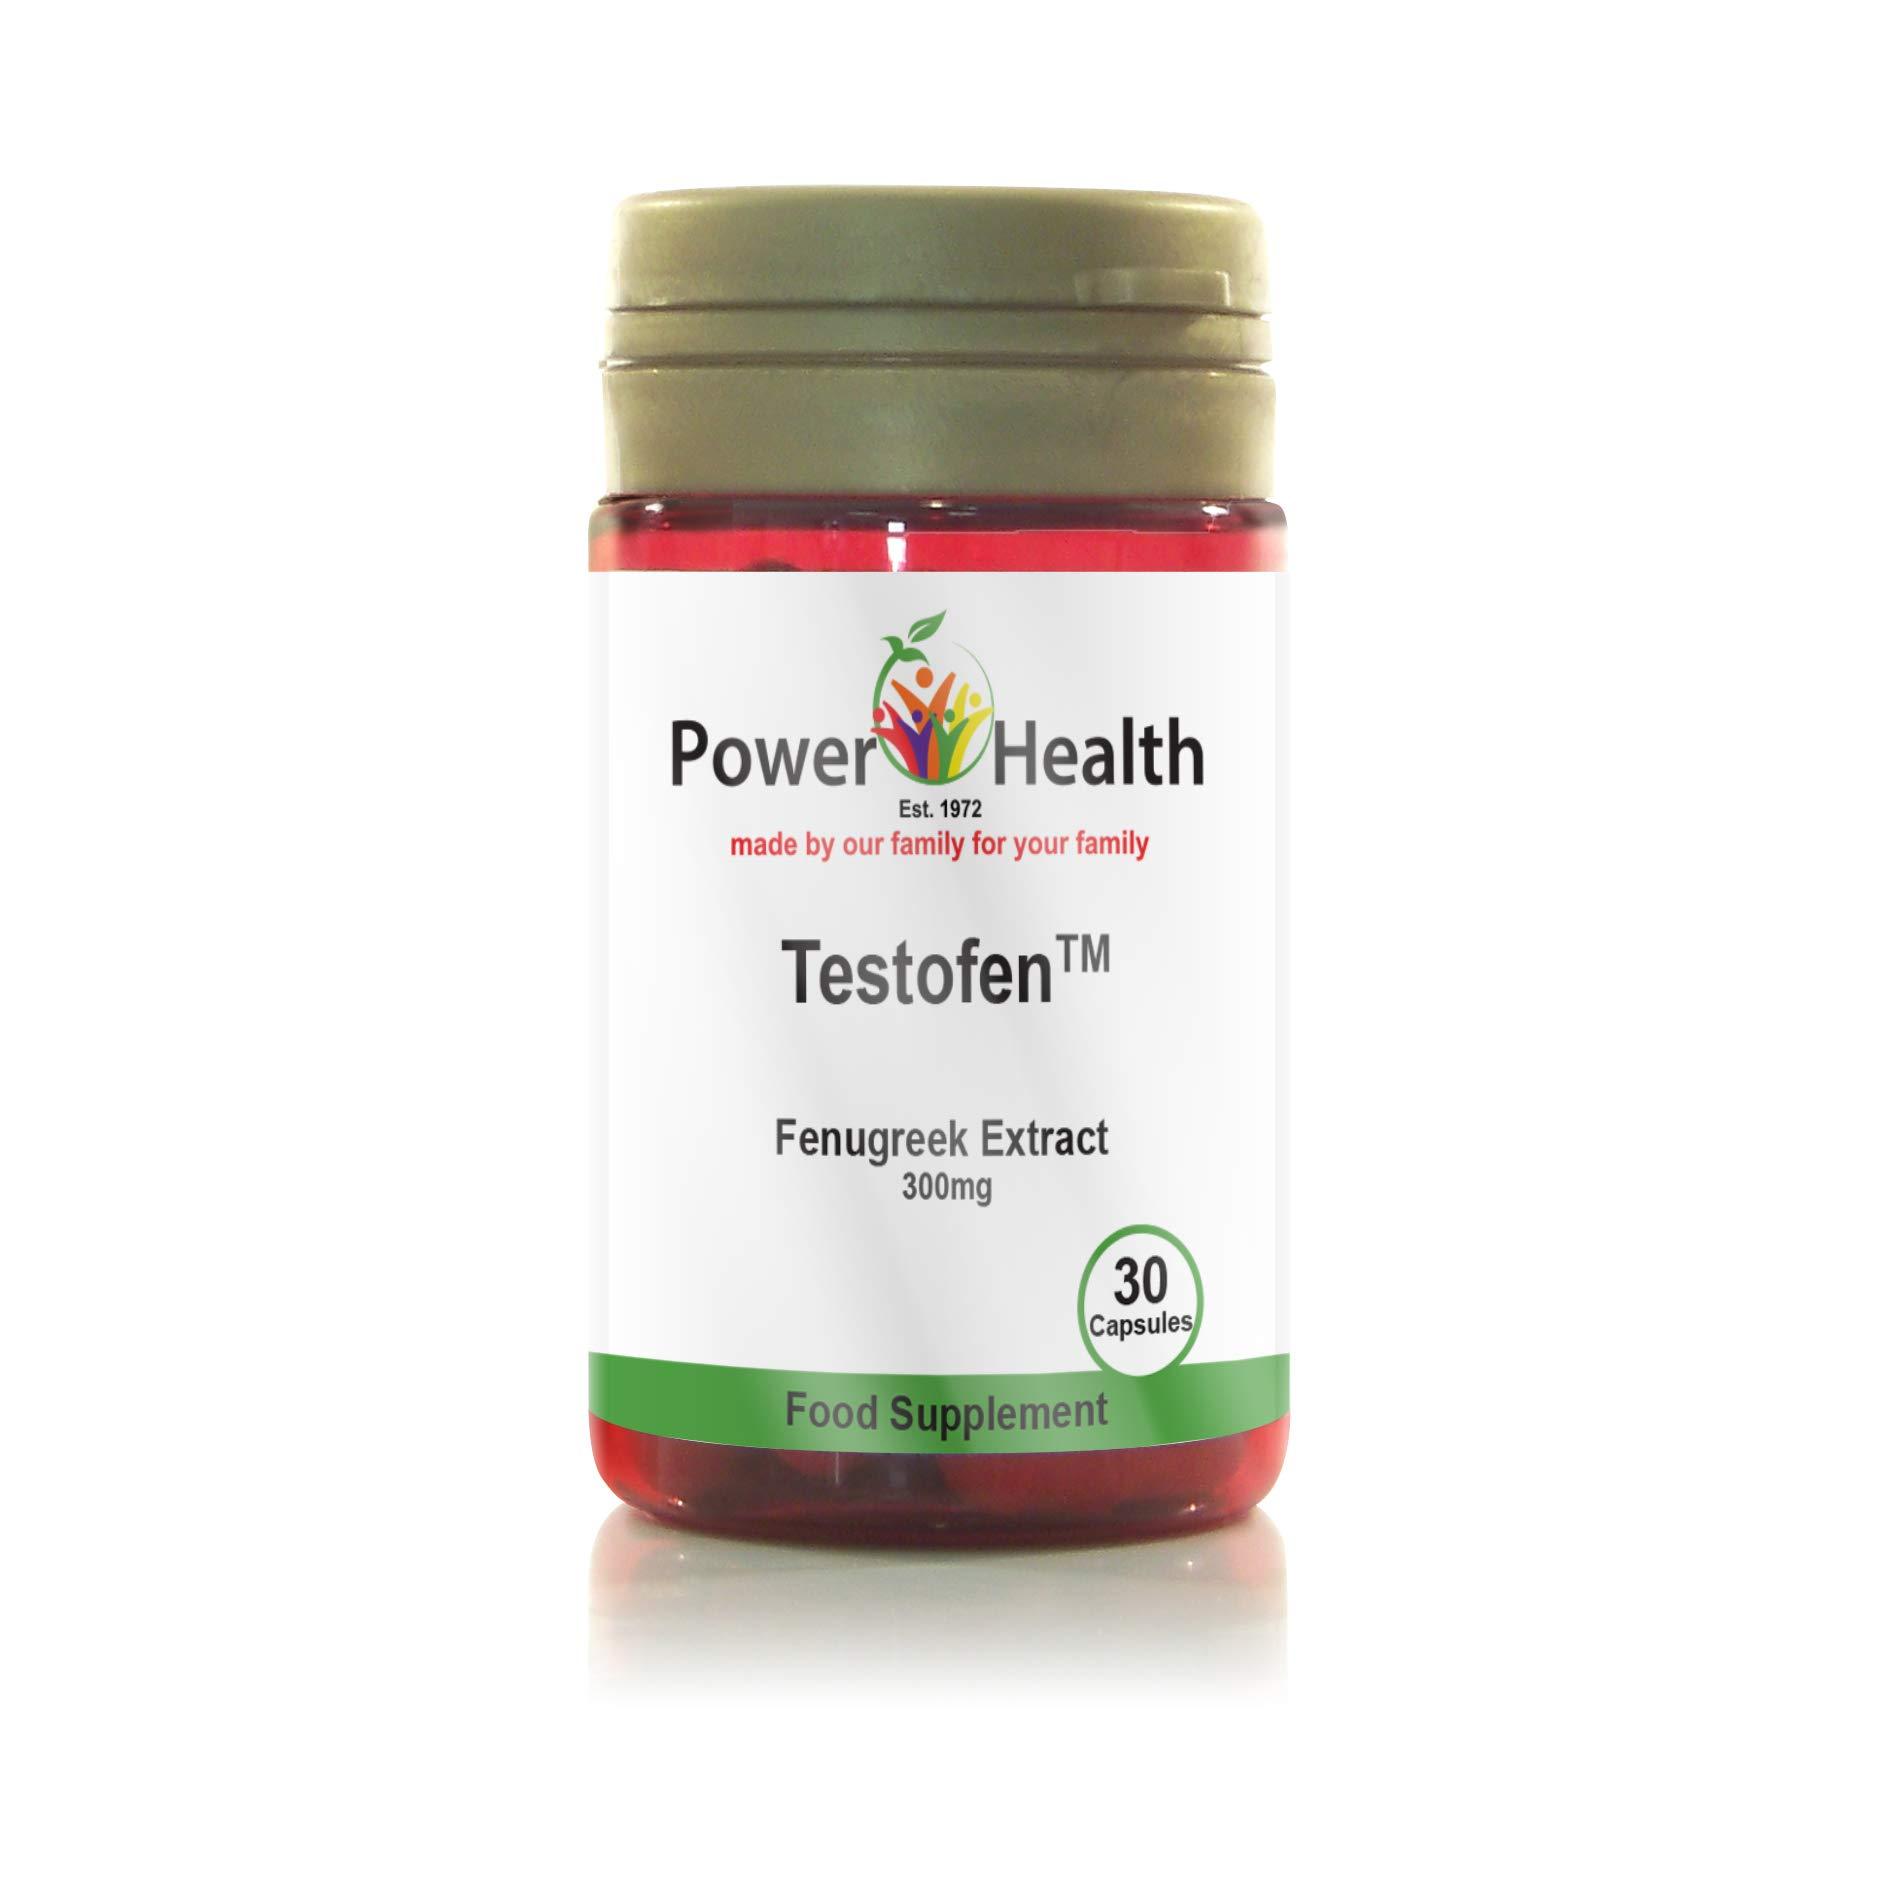 Power Health Testofen